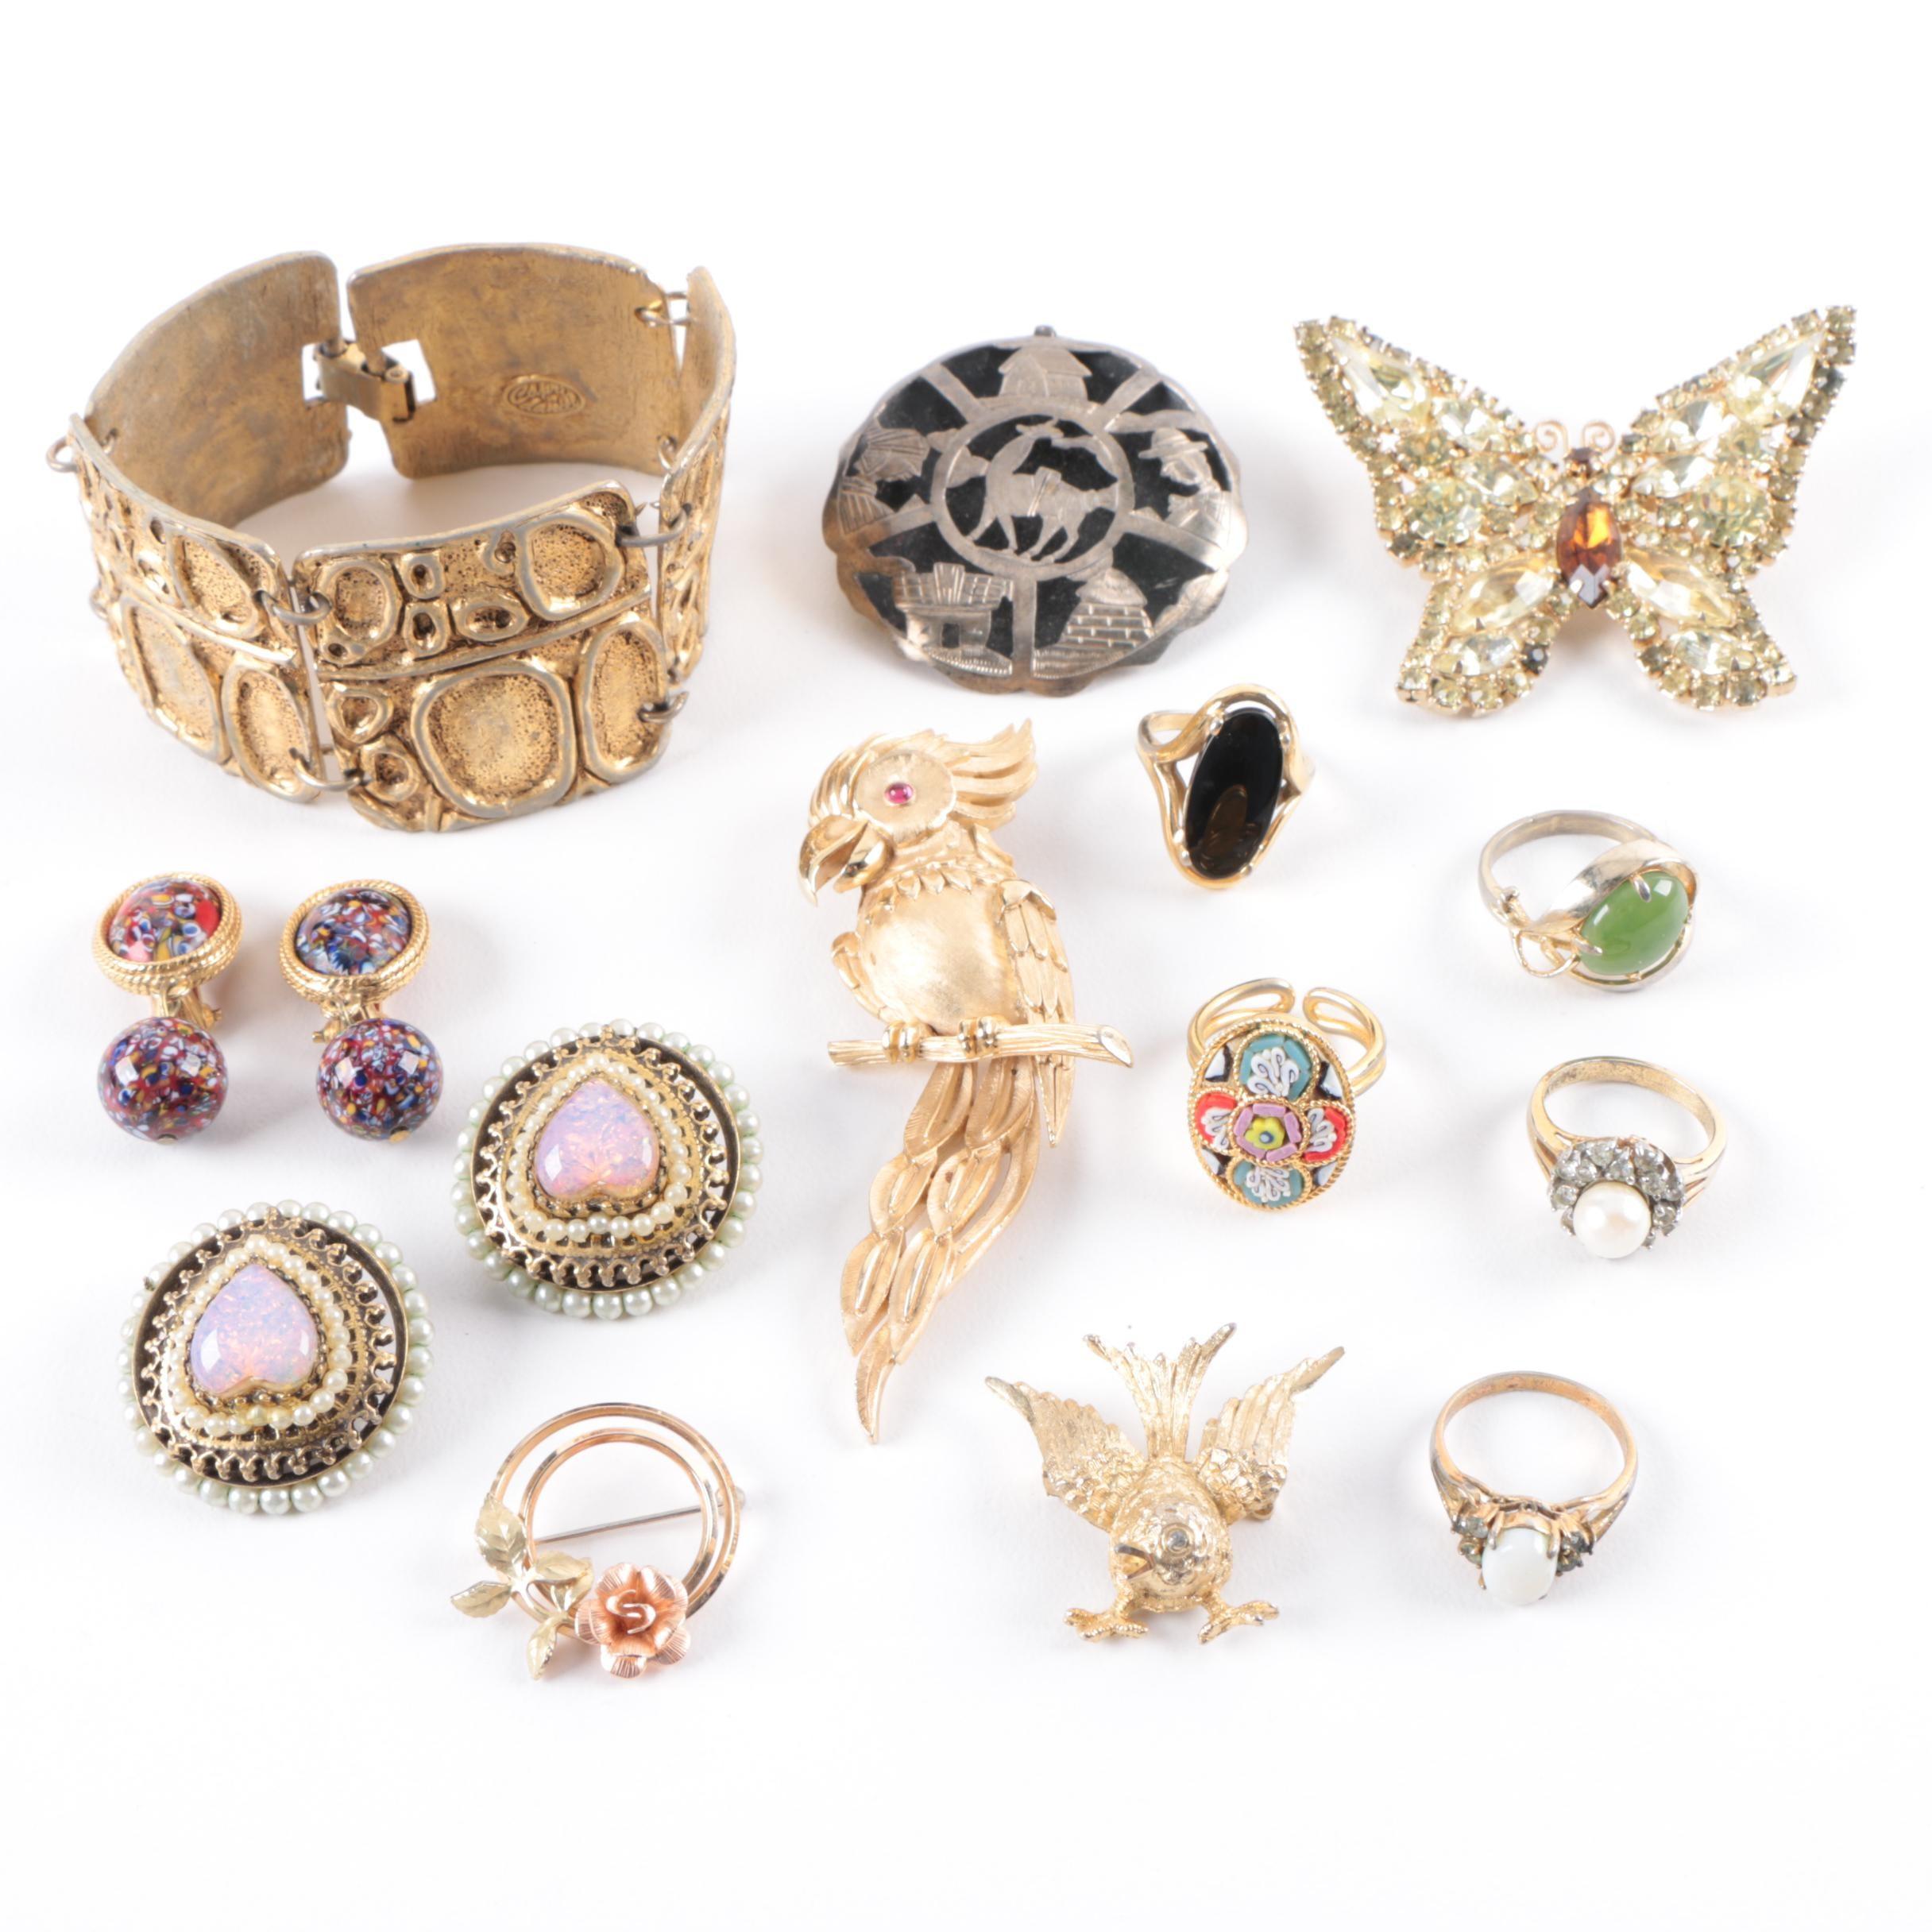 Capri by Daniel, Crown Trifari, Weiss and Krementz Costume Jewelry